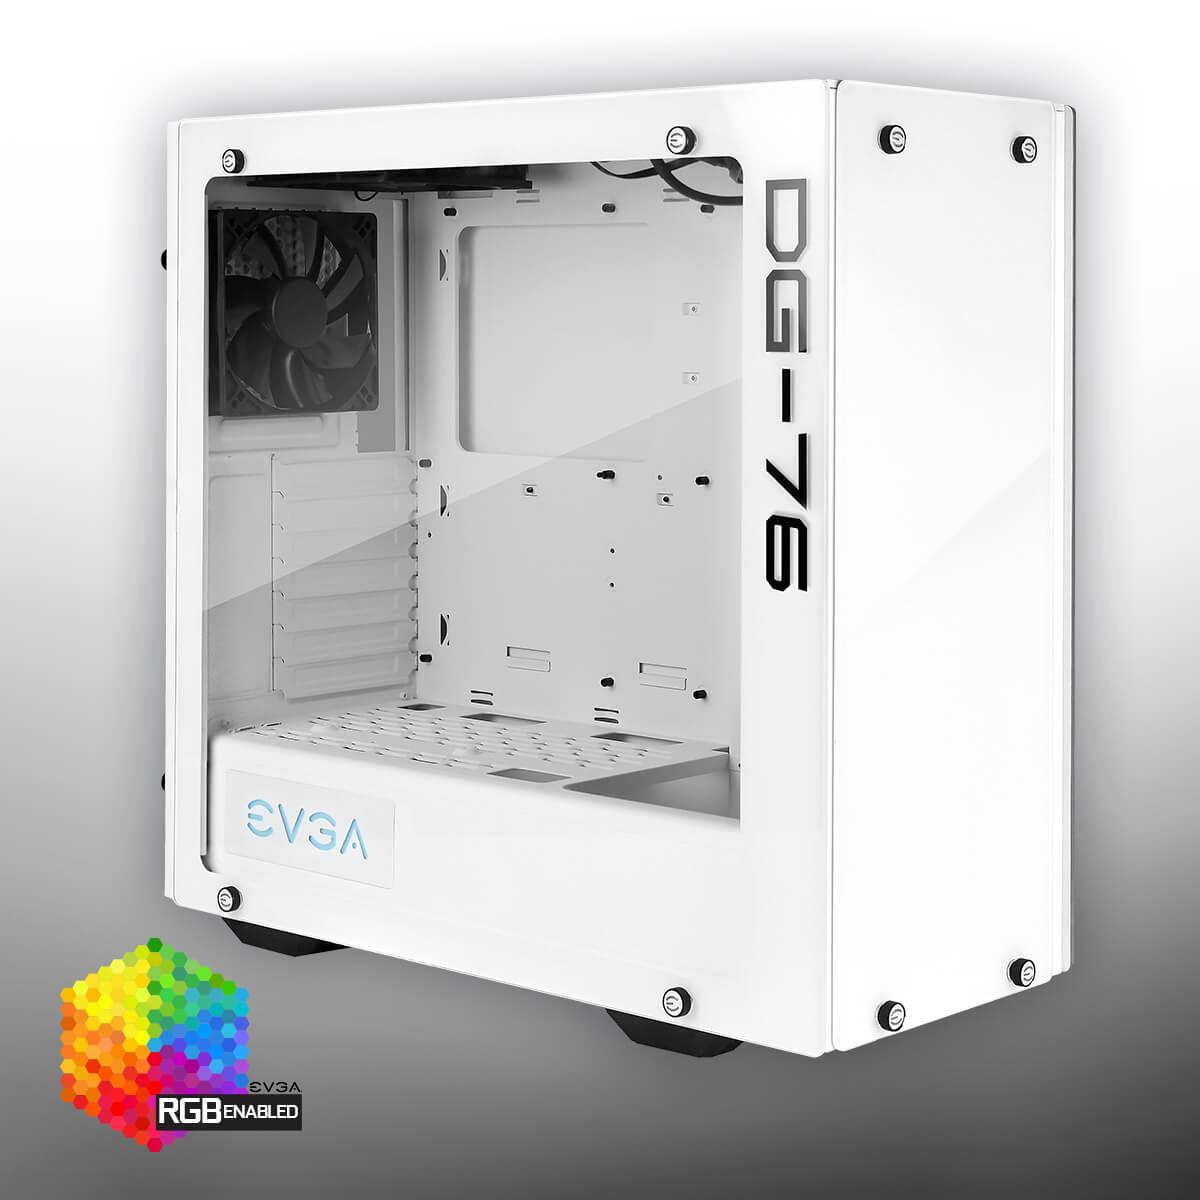 EVGA DG-76 Cristal Templado Blanco - Caja/Torre